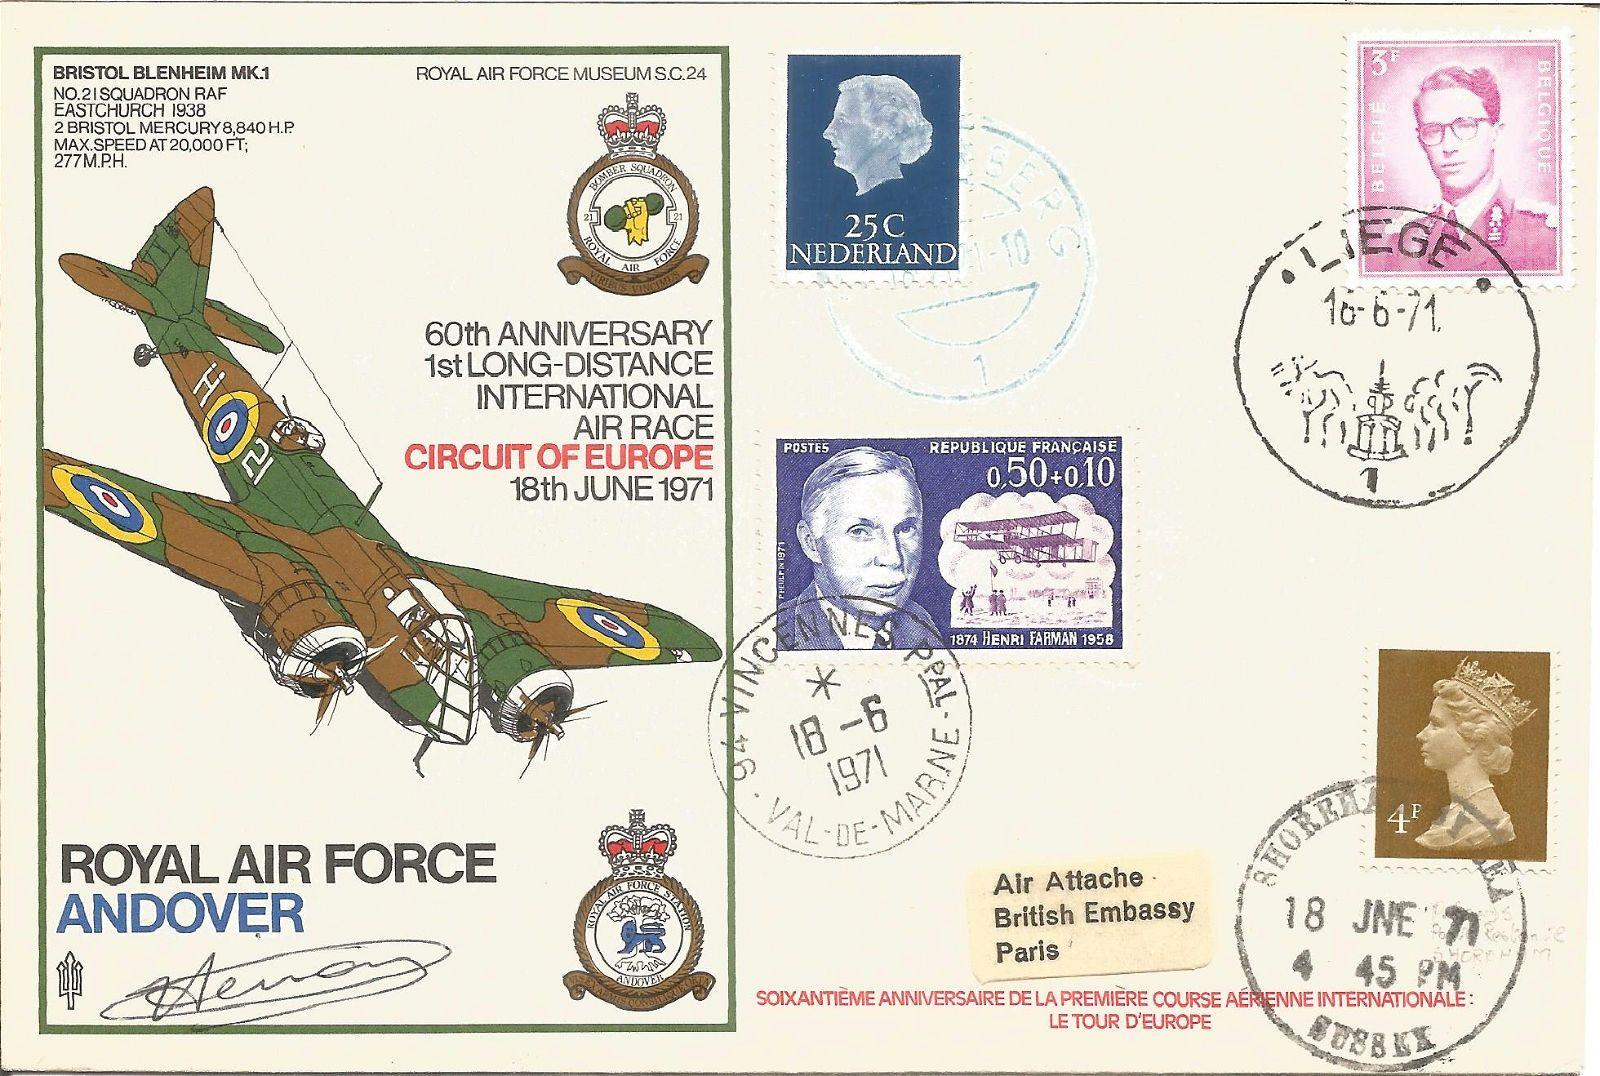 Royal Air Force Andover 60th Anniversary 1st